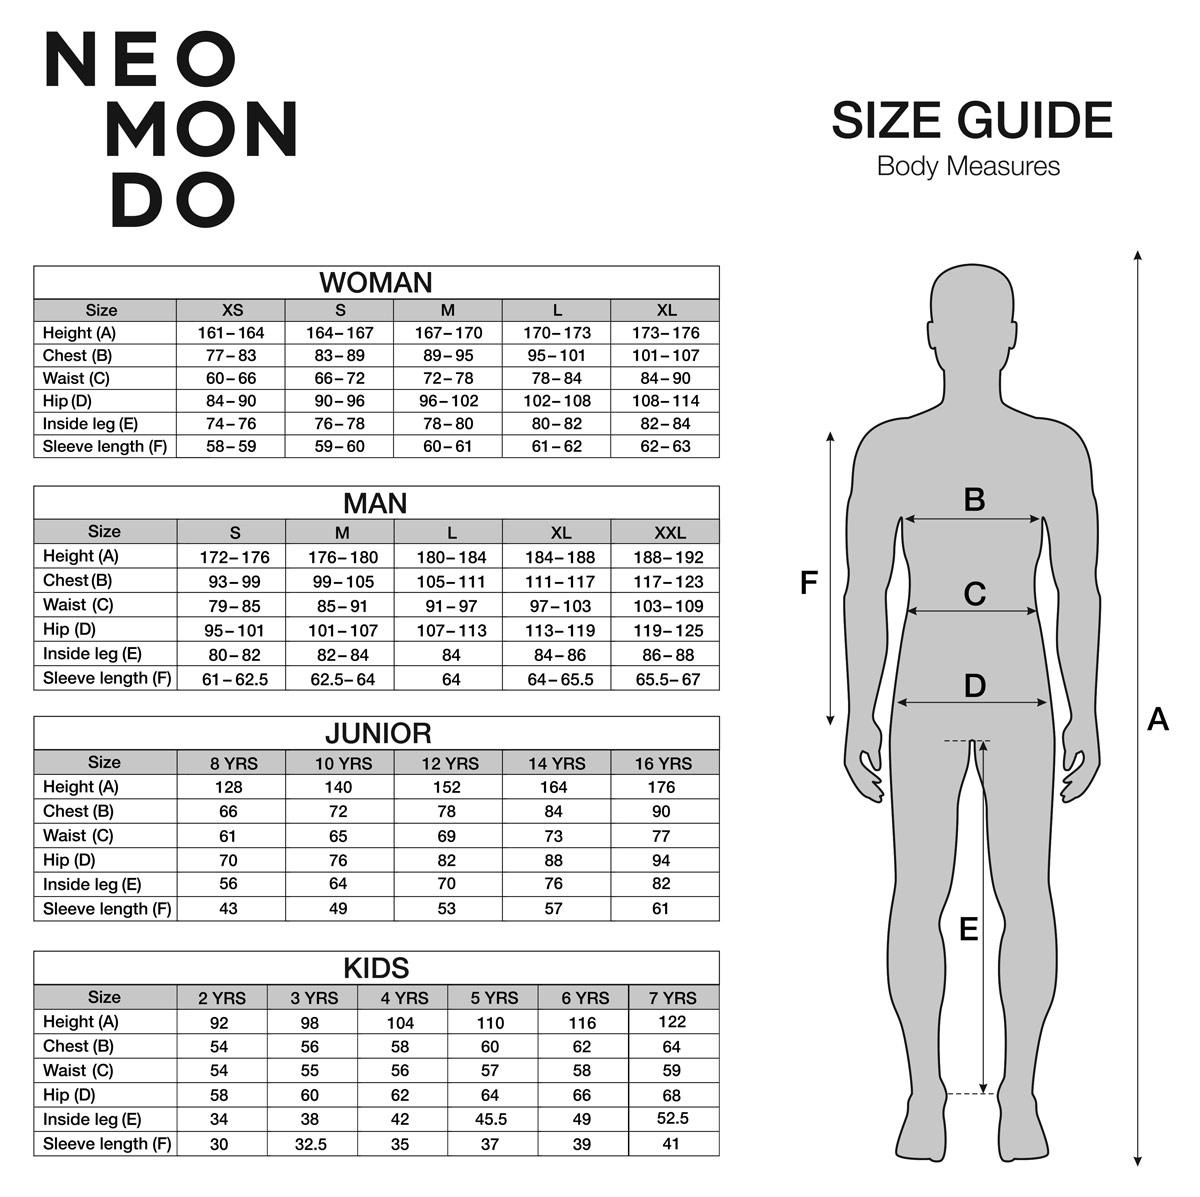 Neomondo-size-guide.jpg